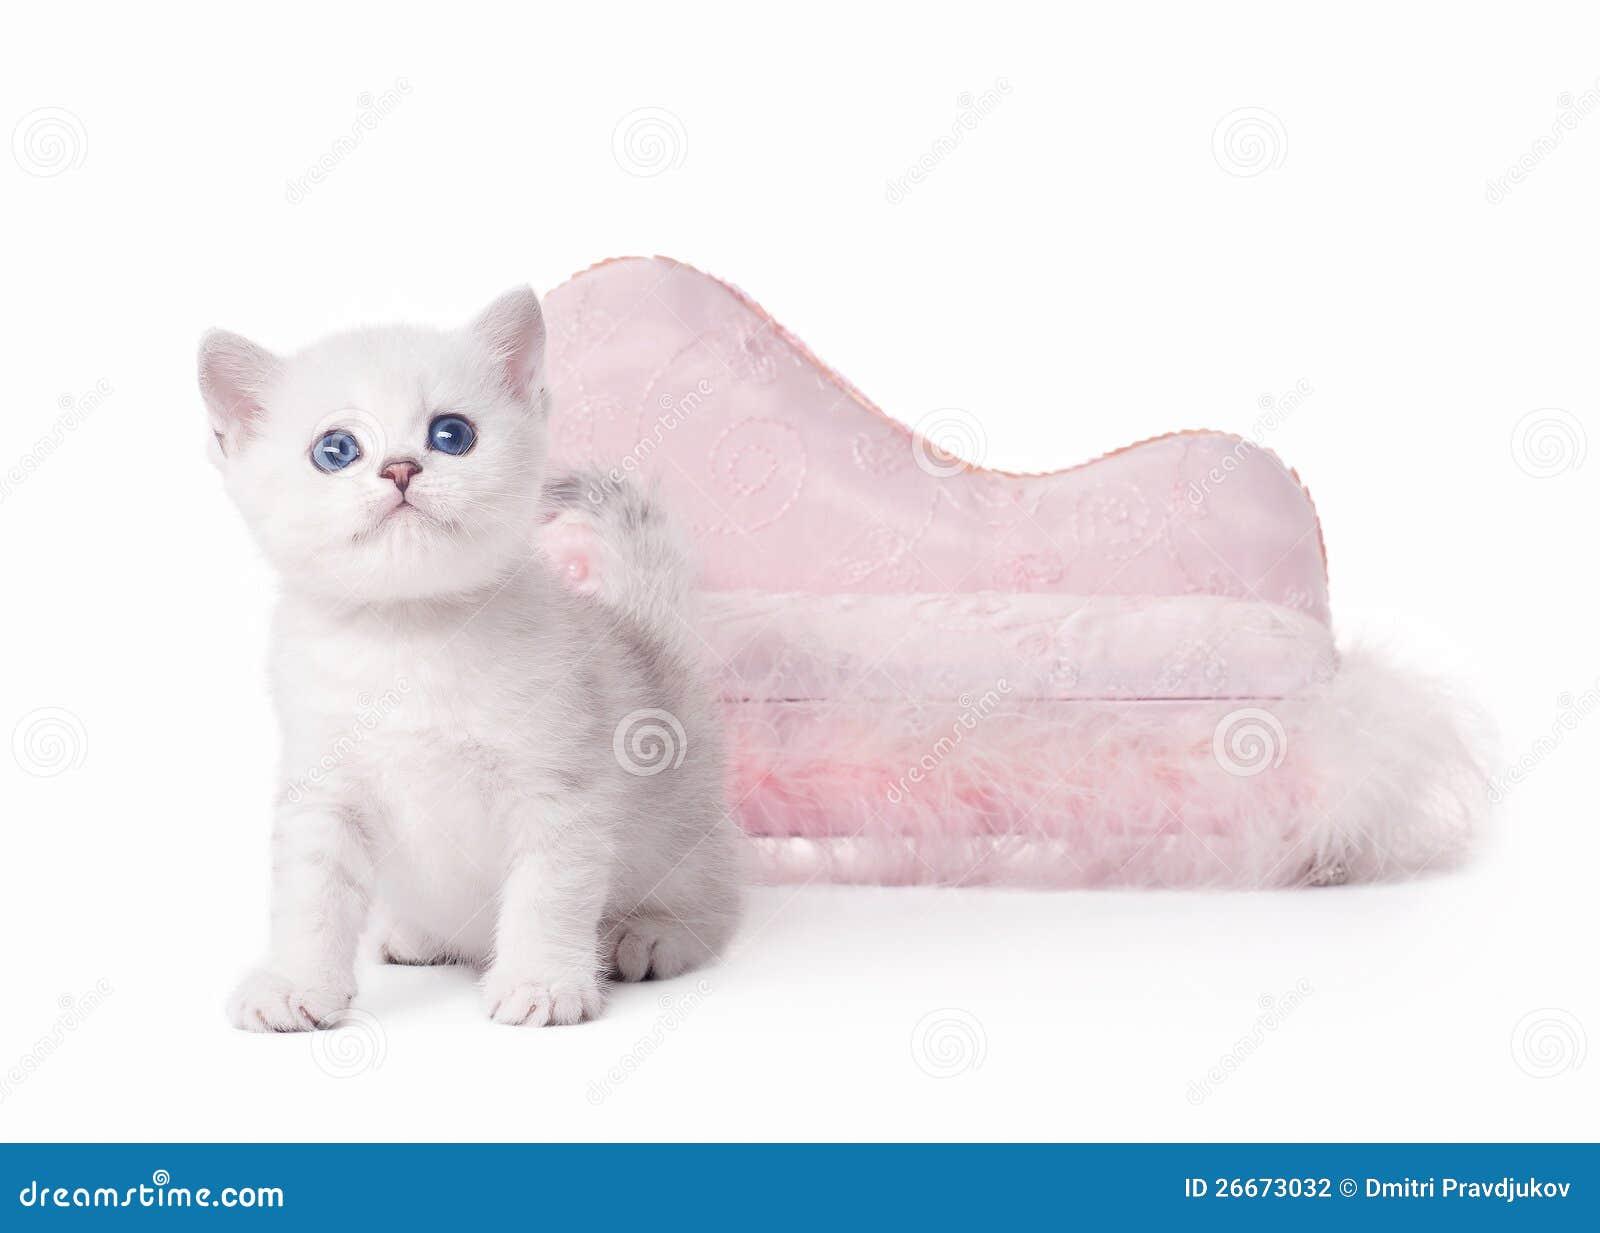 Small silver british kitten with pink divan